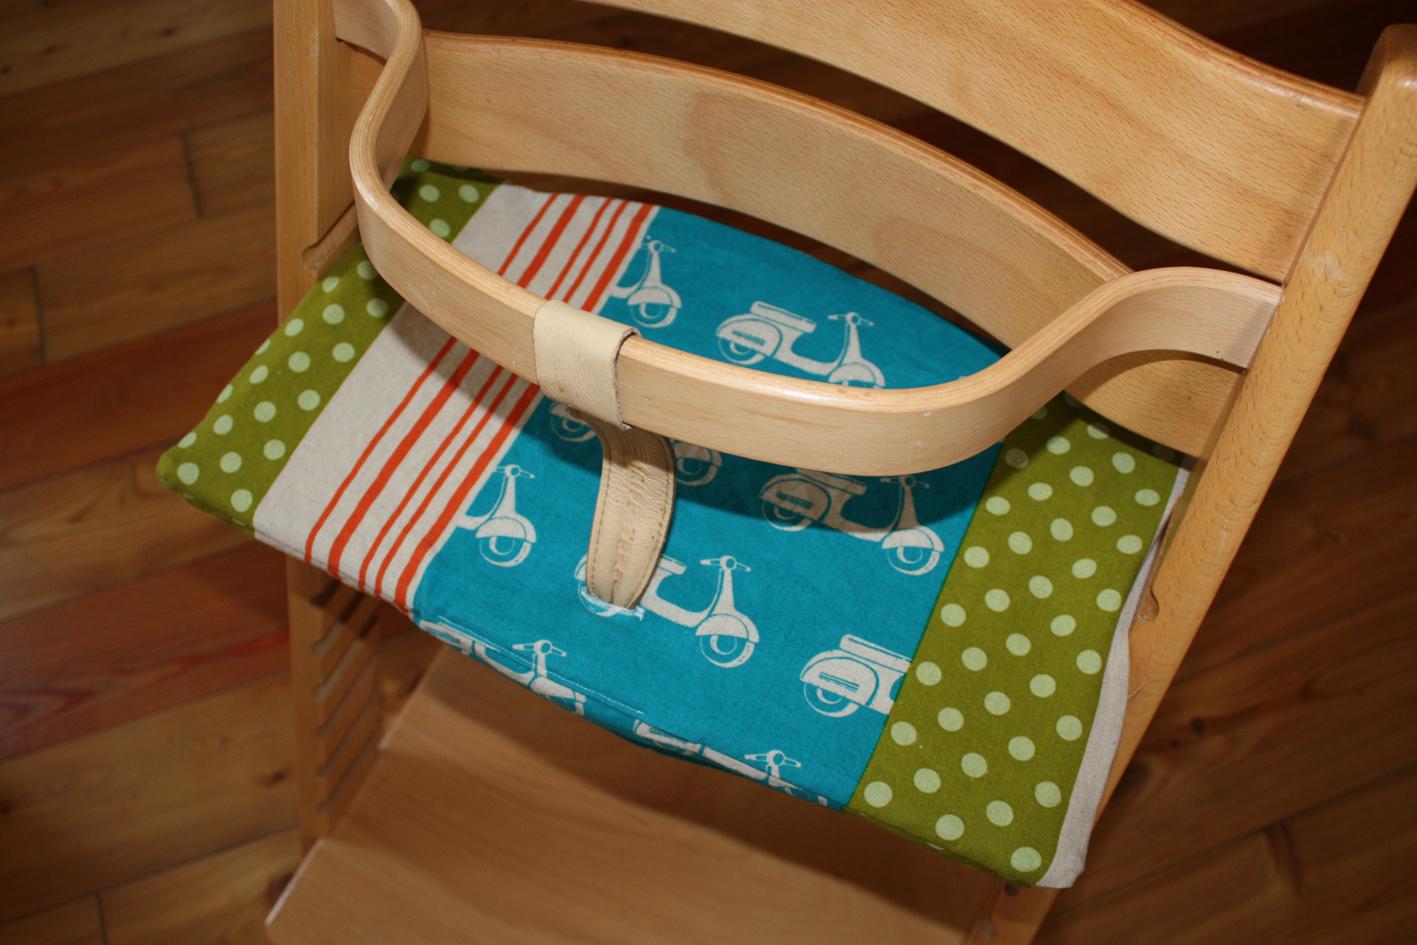 fraufertig step by step hoch hinaus. Black Bedroom Furniture Sets. Home Design Ideas